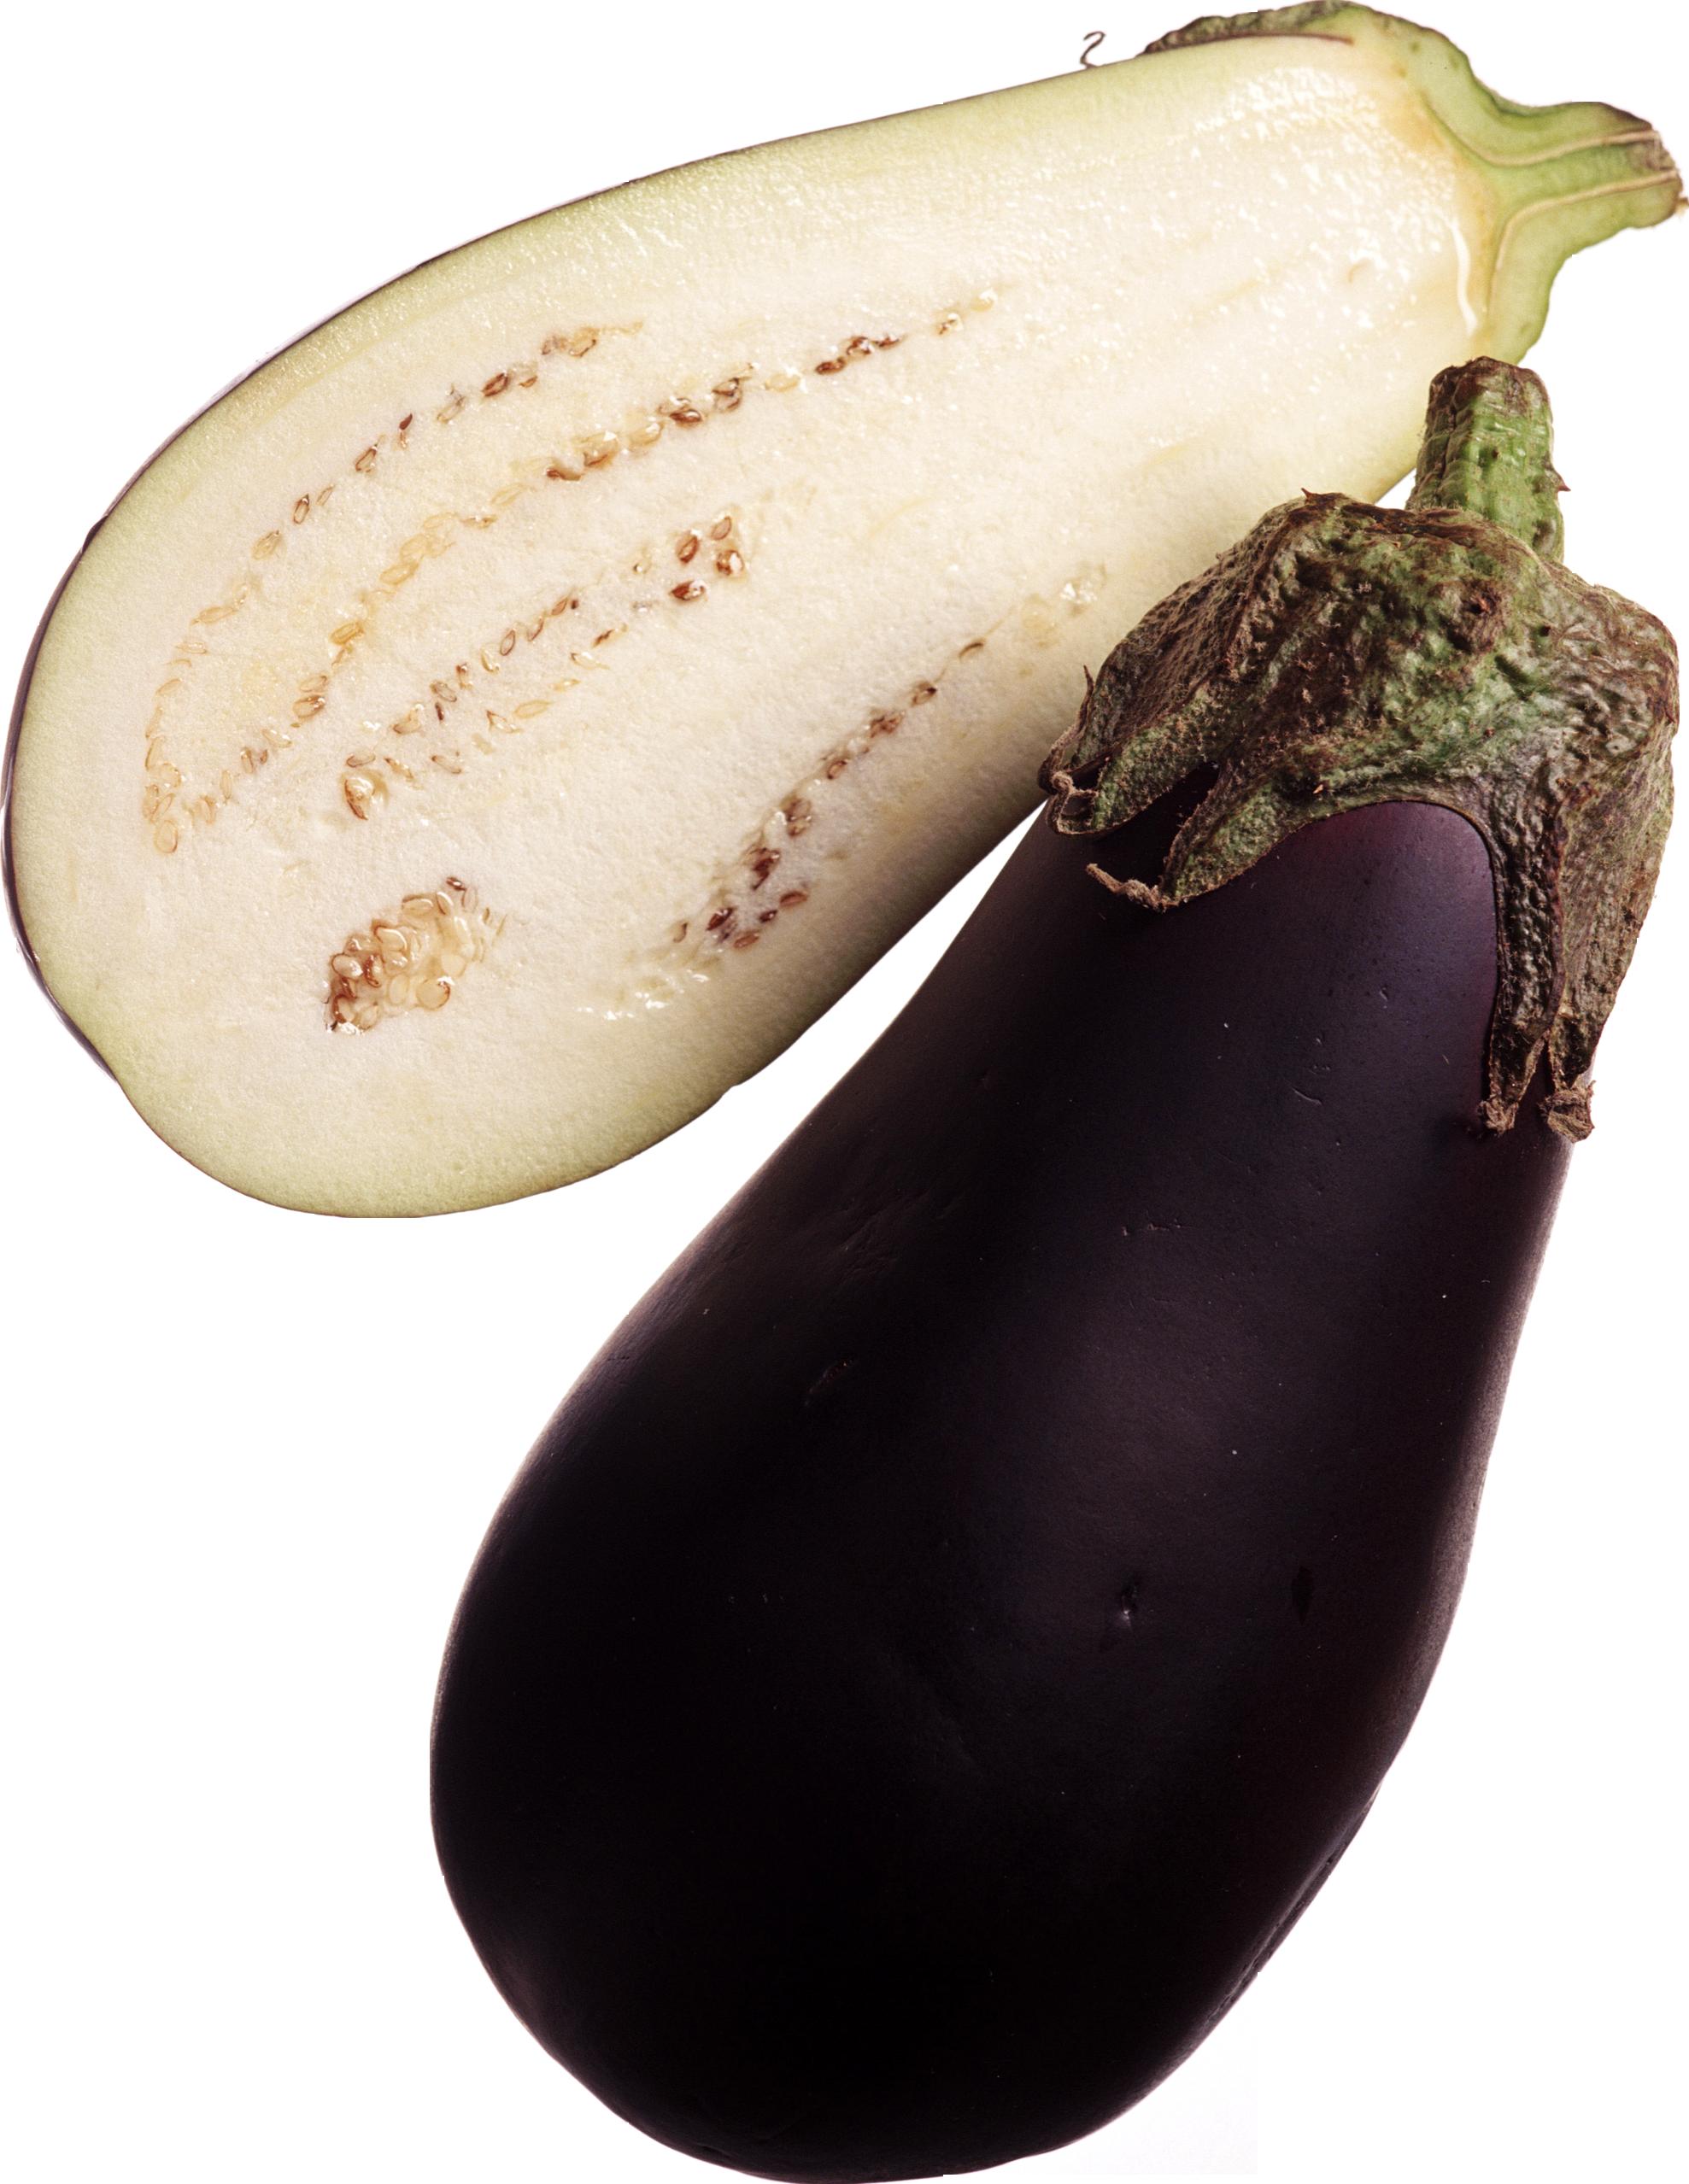 Eggplant Png Images Free Download - Eggplant, Transparent background PNG HD thumbnail